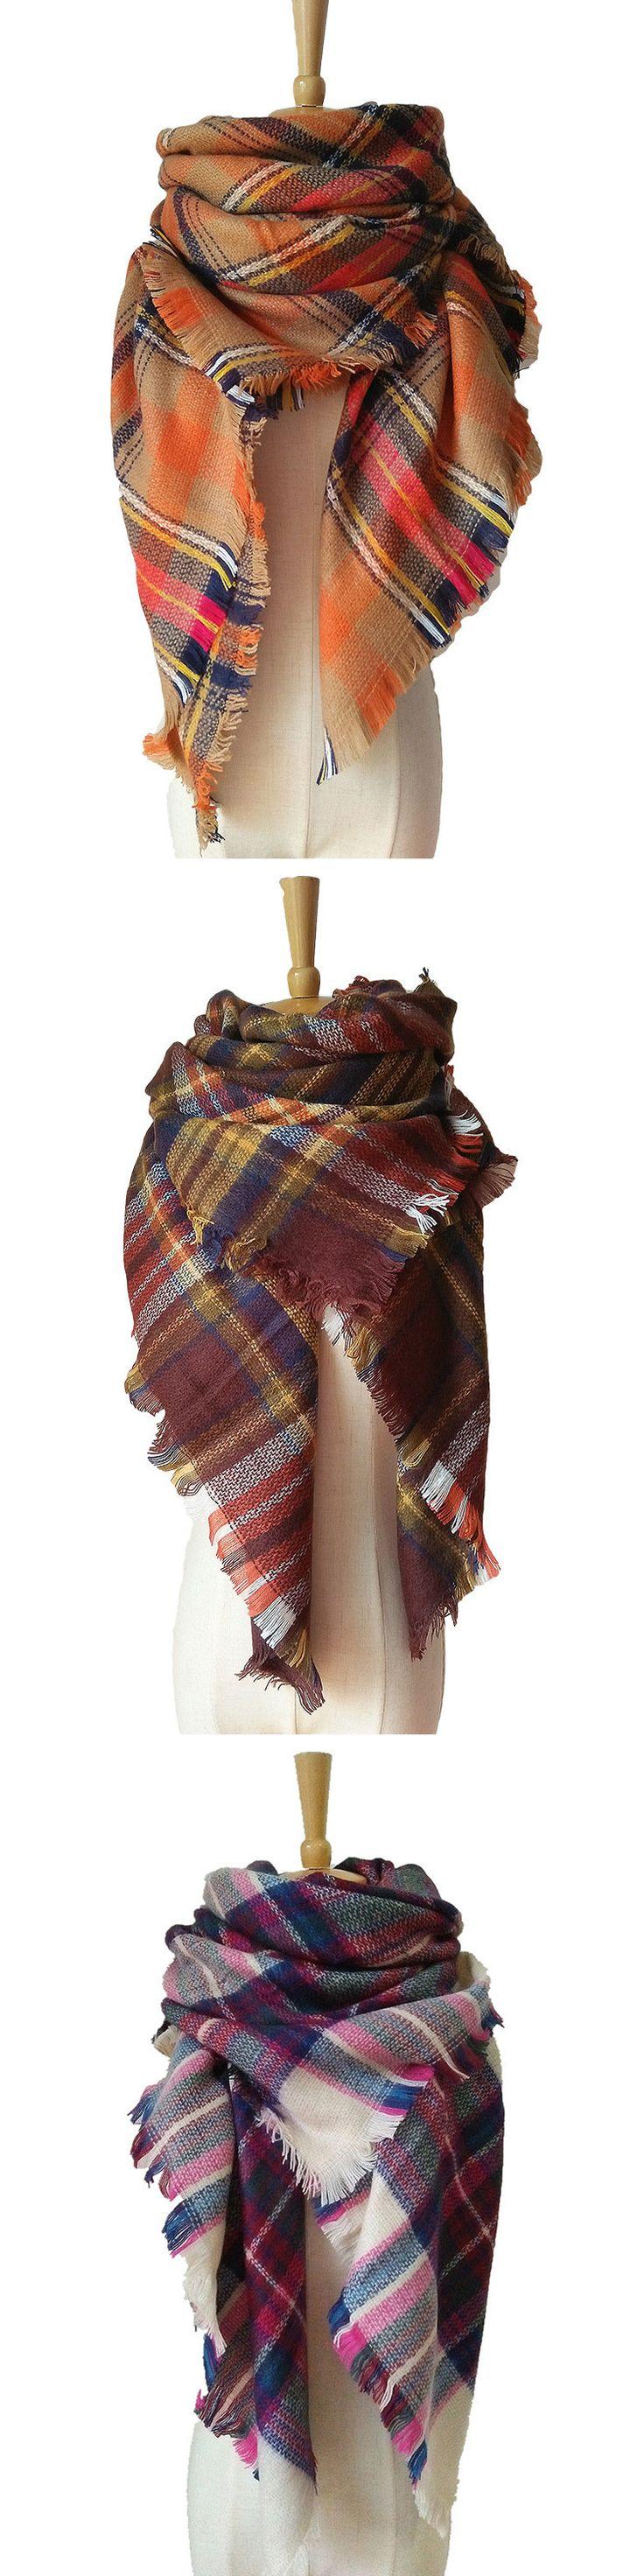 Tartan Plaid Blanket Scarf For Women Bandana Warm Square Scarves Winter Scarf Shawl Blanket